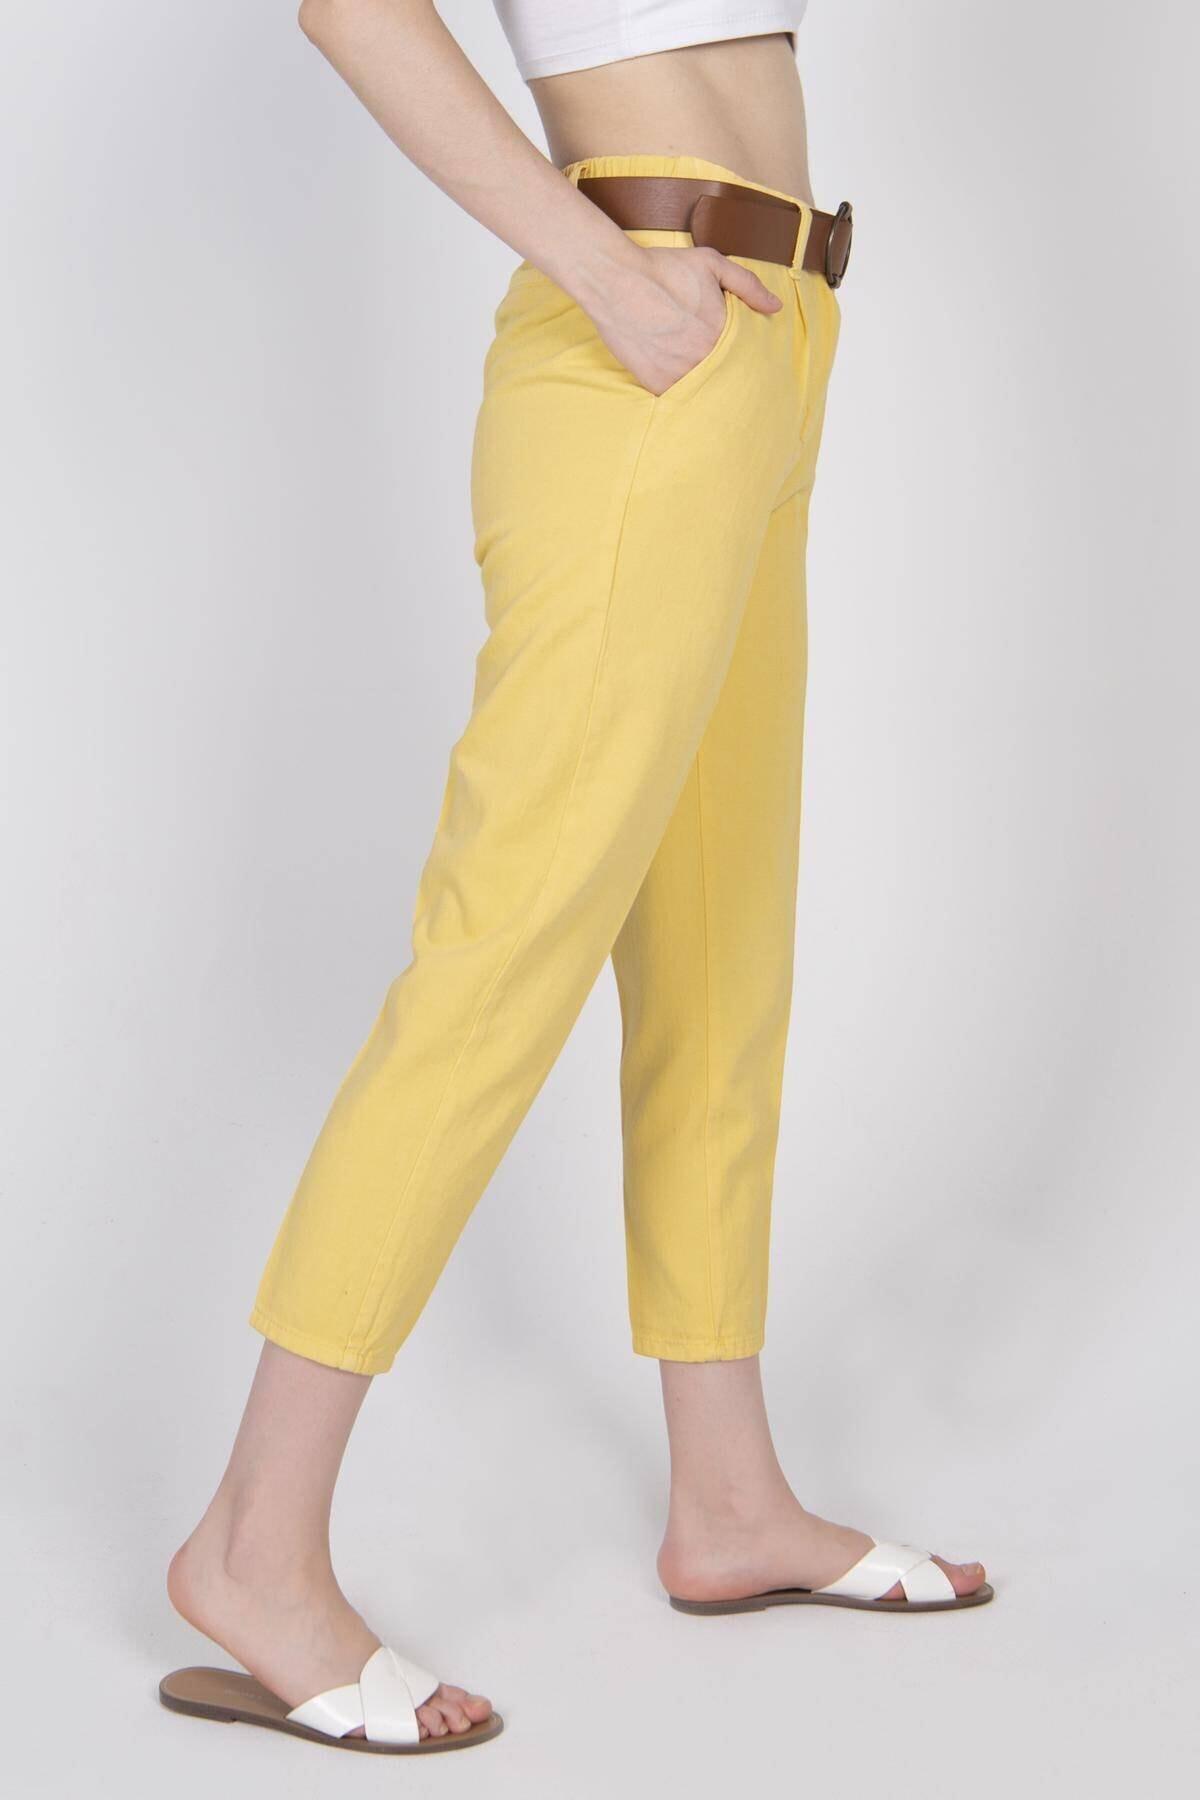 Addax Kadın Sarı Kemerli Pantolon PN4204 - T3 ADX-0000020952 3